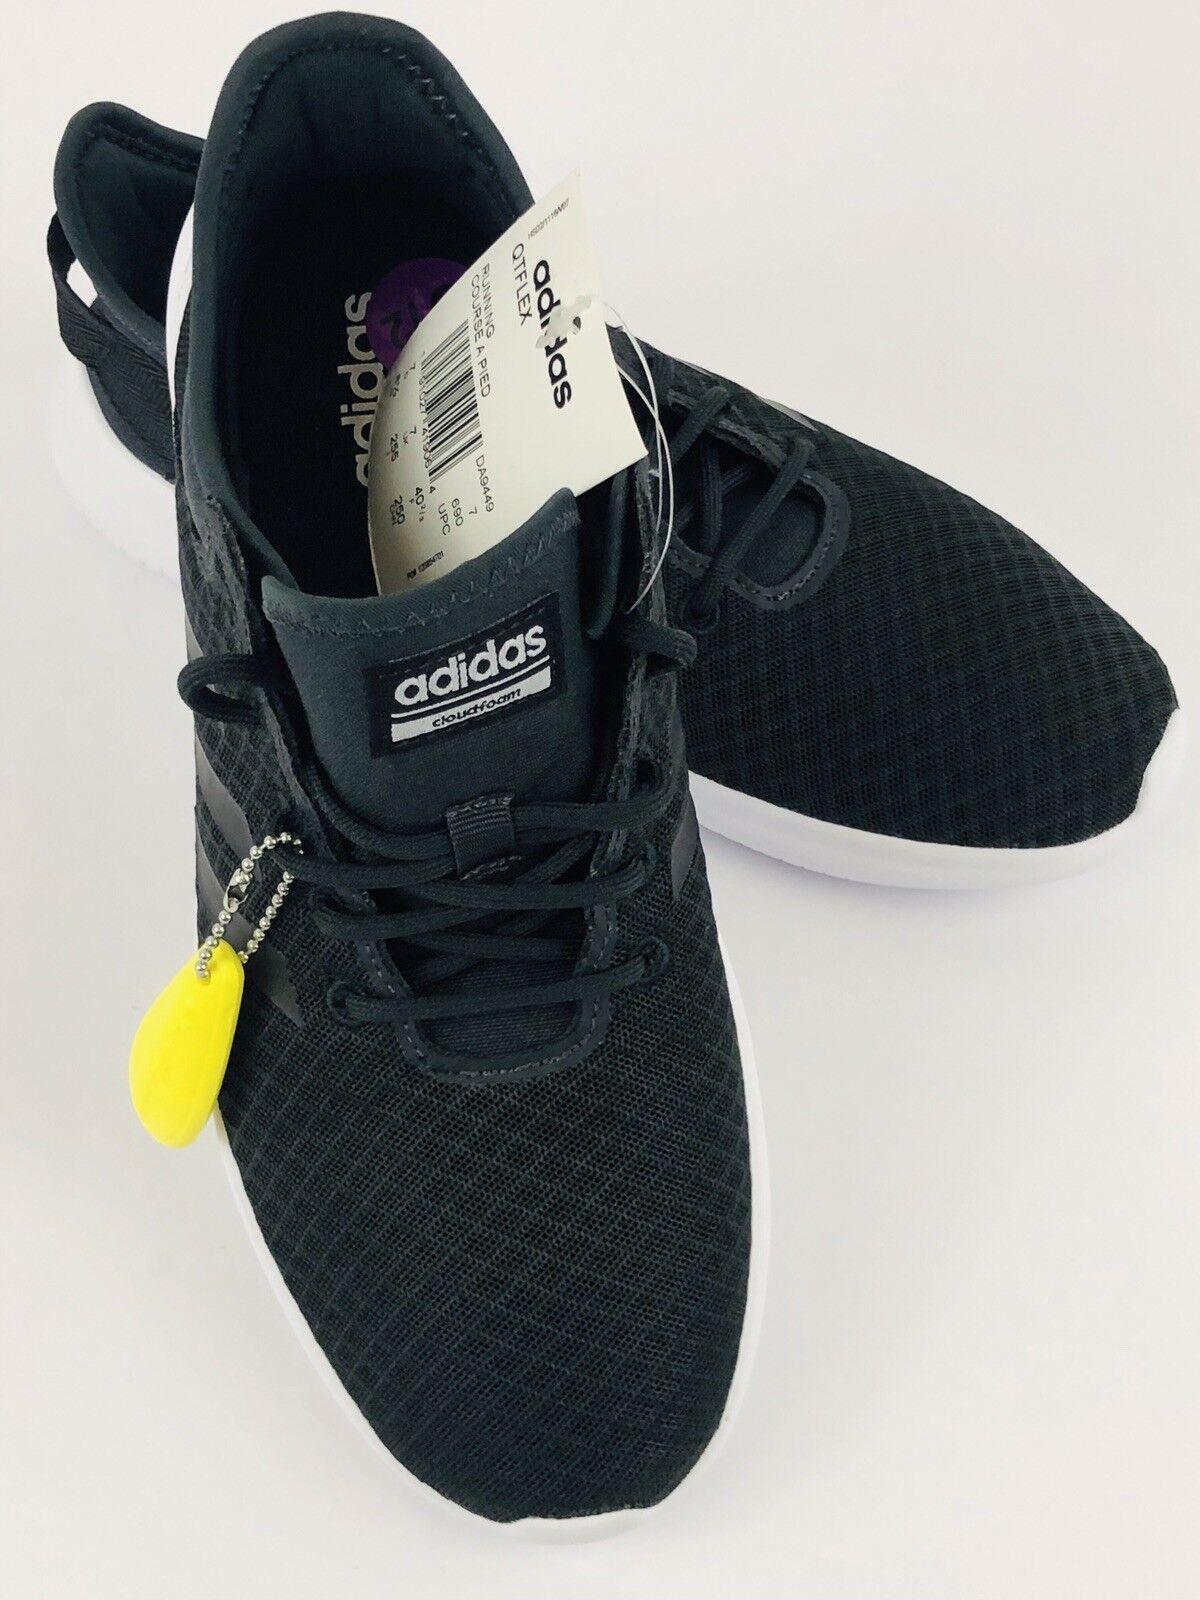 Women's Adidas Cloudfoam QT Flex Athletic Running Sport shoes DA9449 Size 7.5